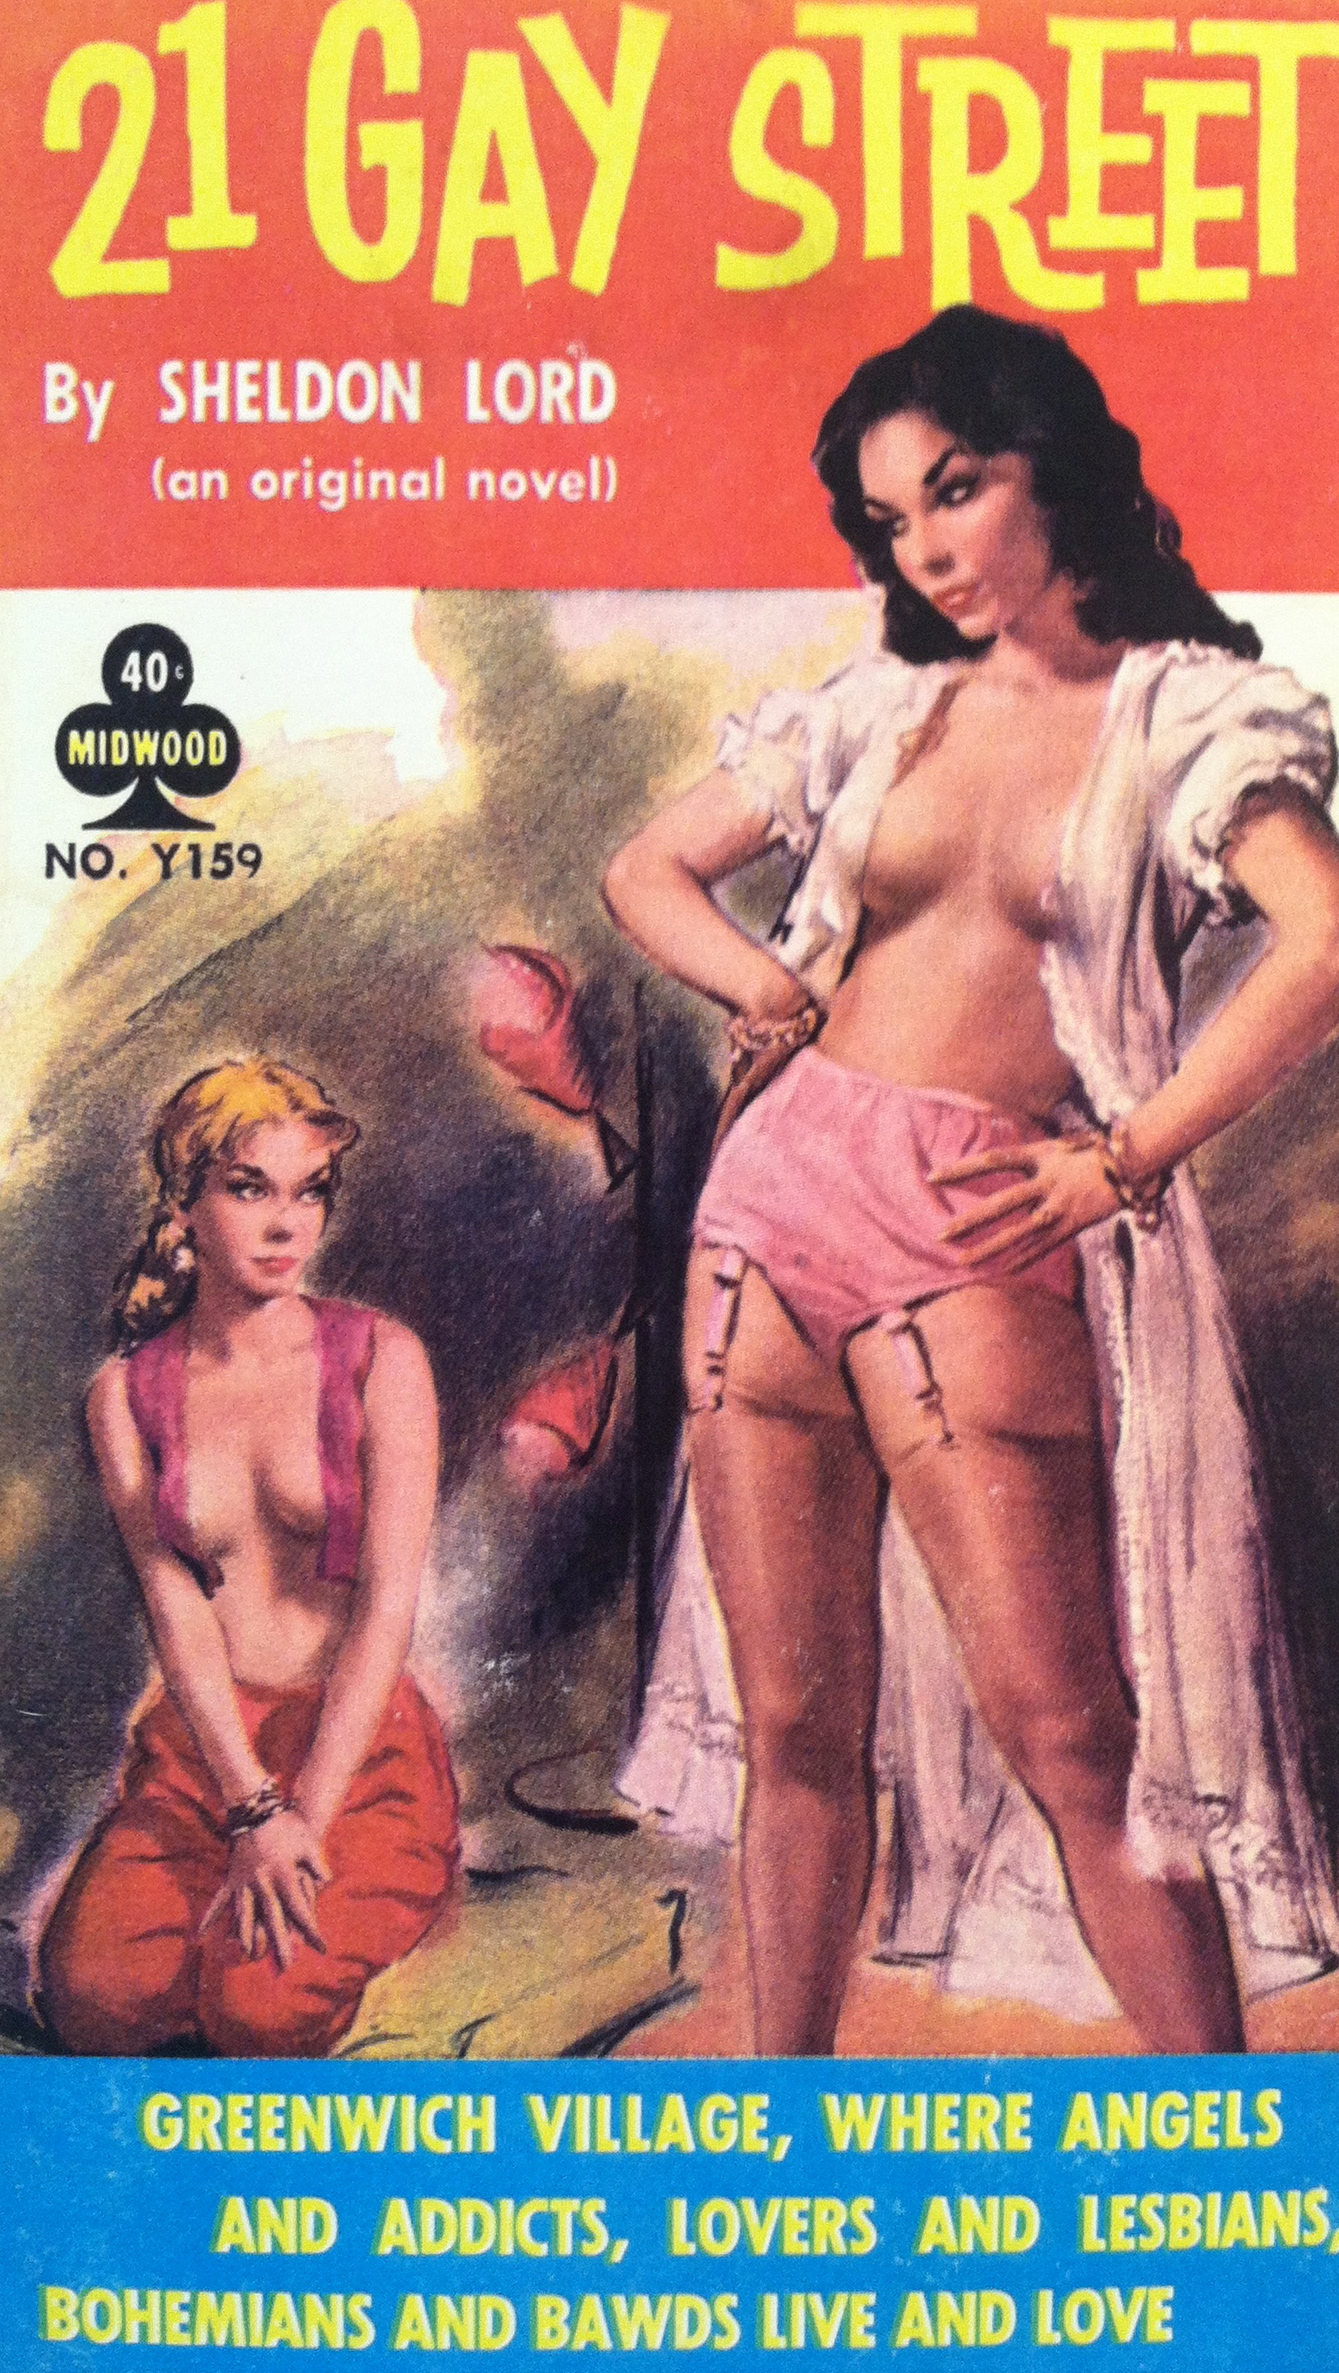 from Matias transgender sci fi erotica